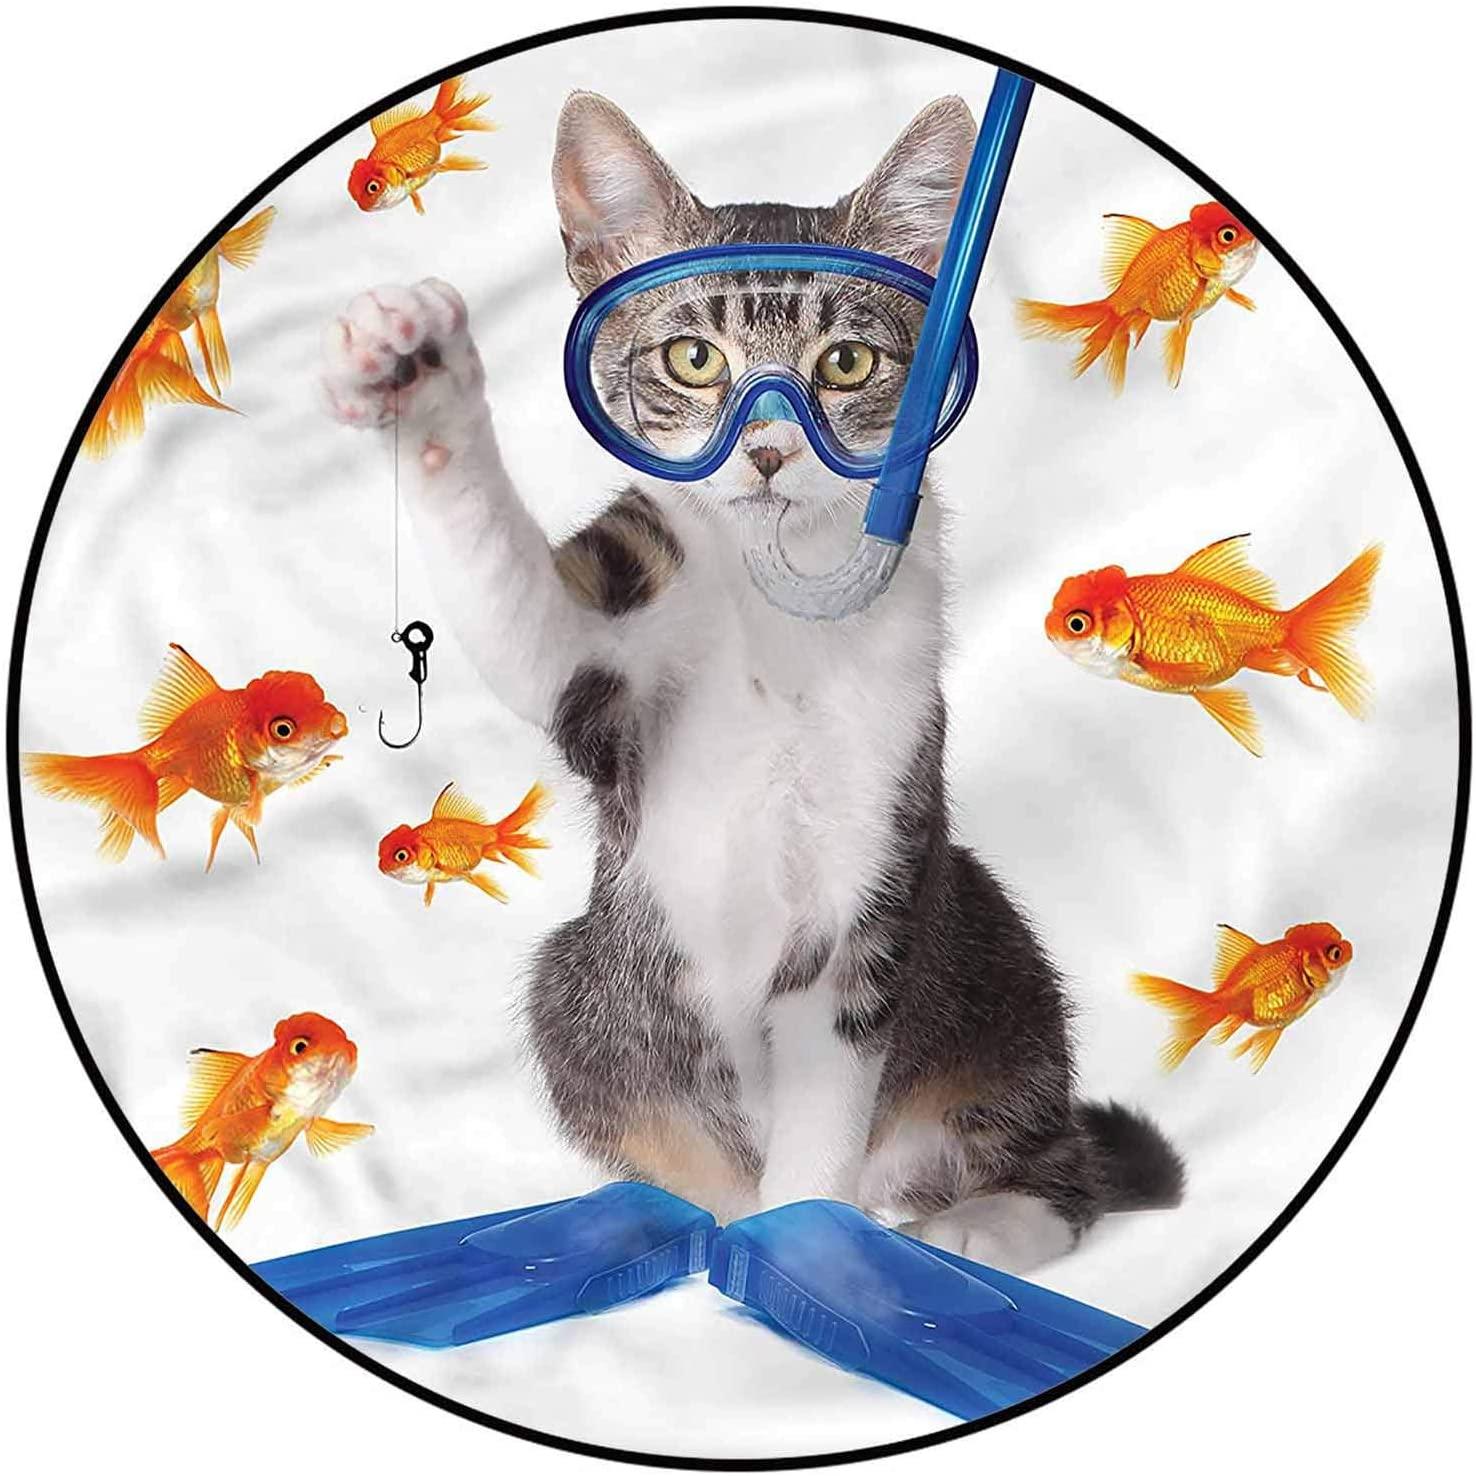 Cat Outdoor Patio Rug 6 Ft, Humorous Goldfish Fishing Theme Custom Rug